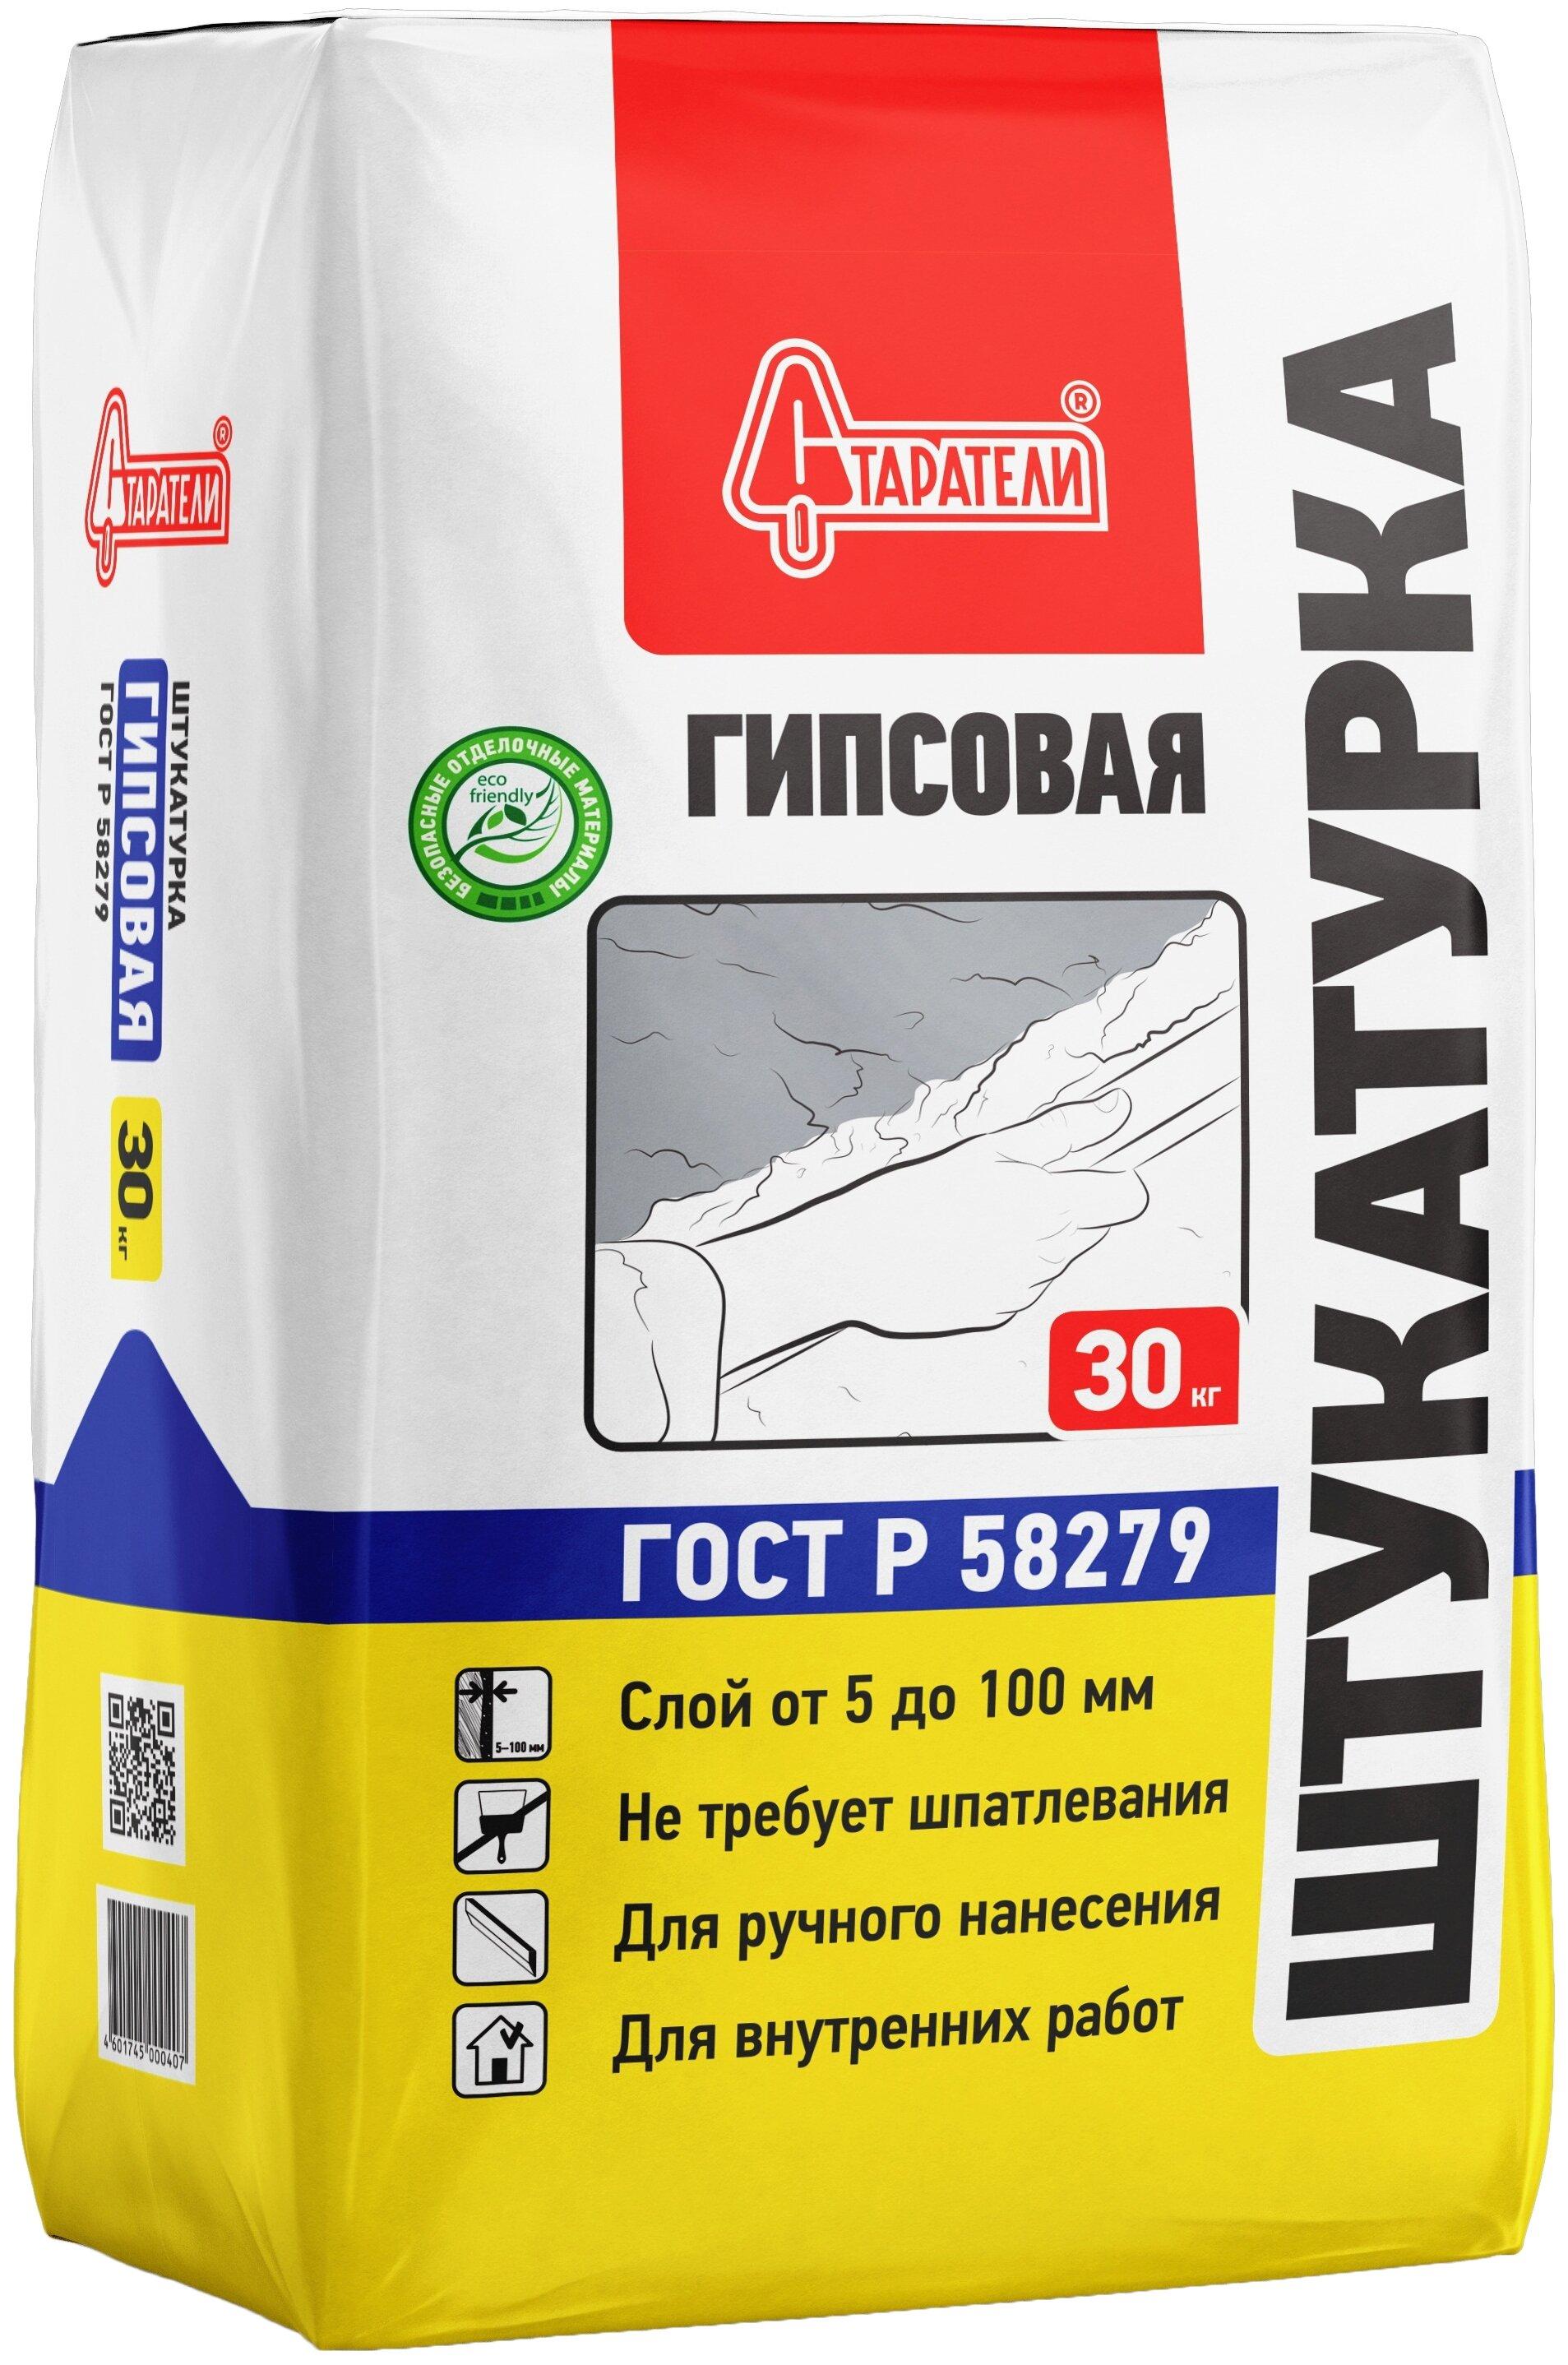 Штукатурка Старатели Гипсовая, 30 кг — цены на Яндекс.Маркете